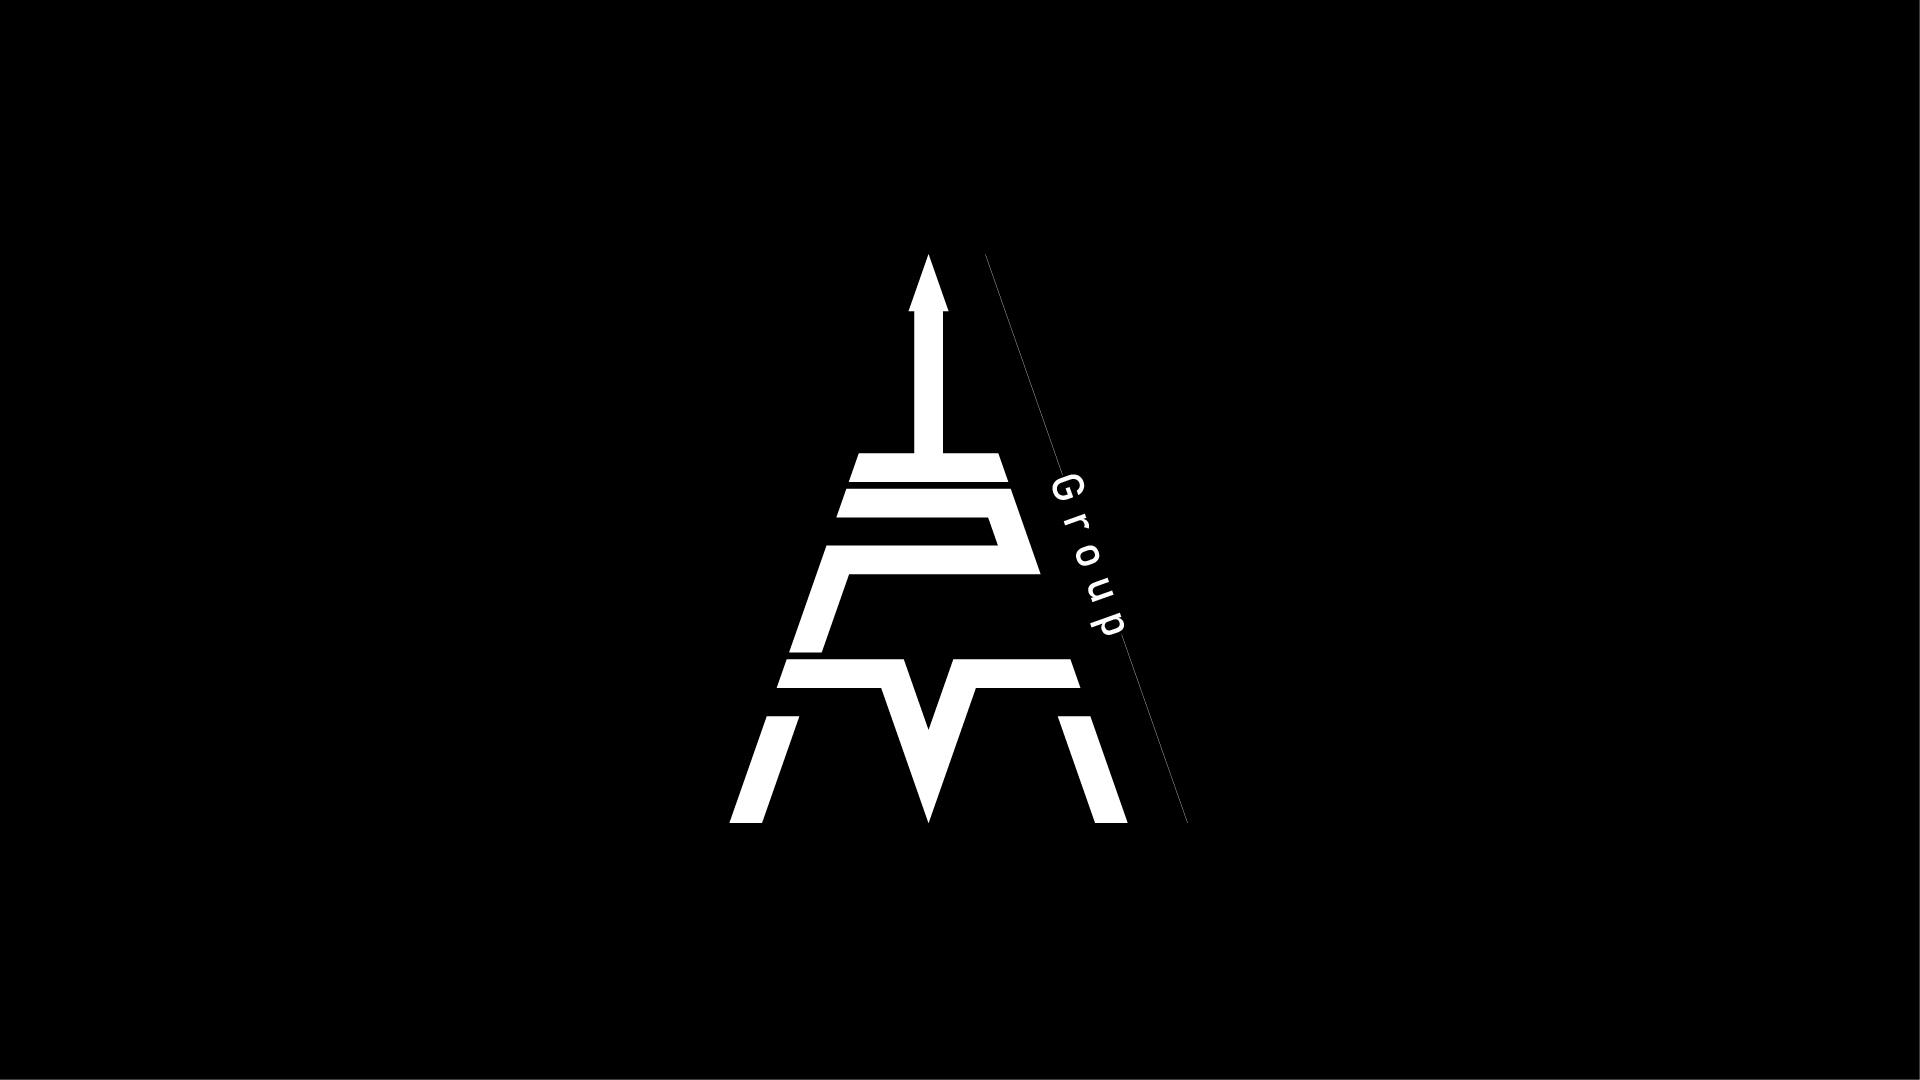 Разработка логотипа для управляющей компании фото f_6635f8437ecb21fd.jpg